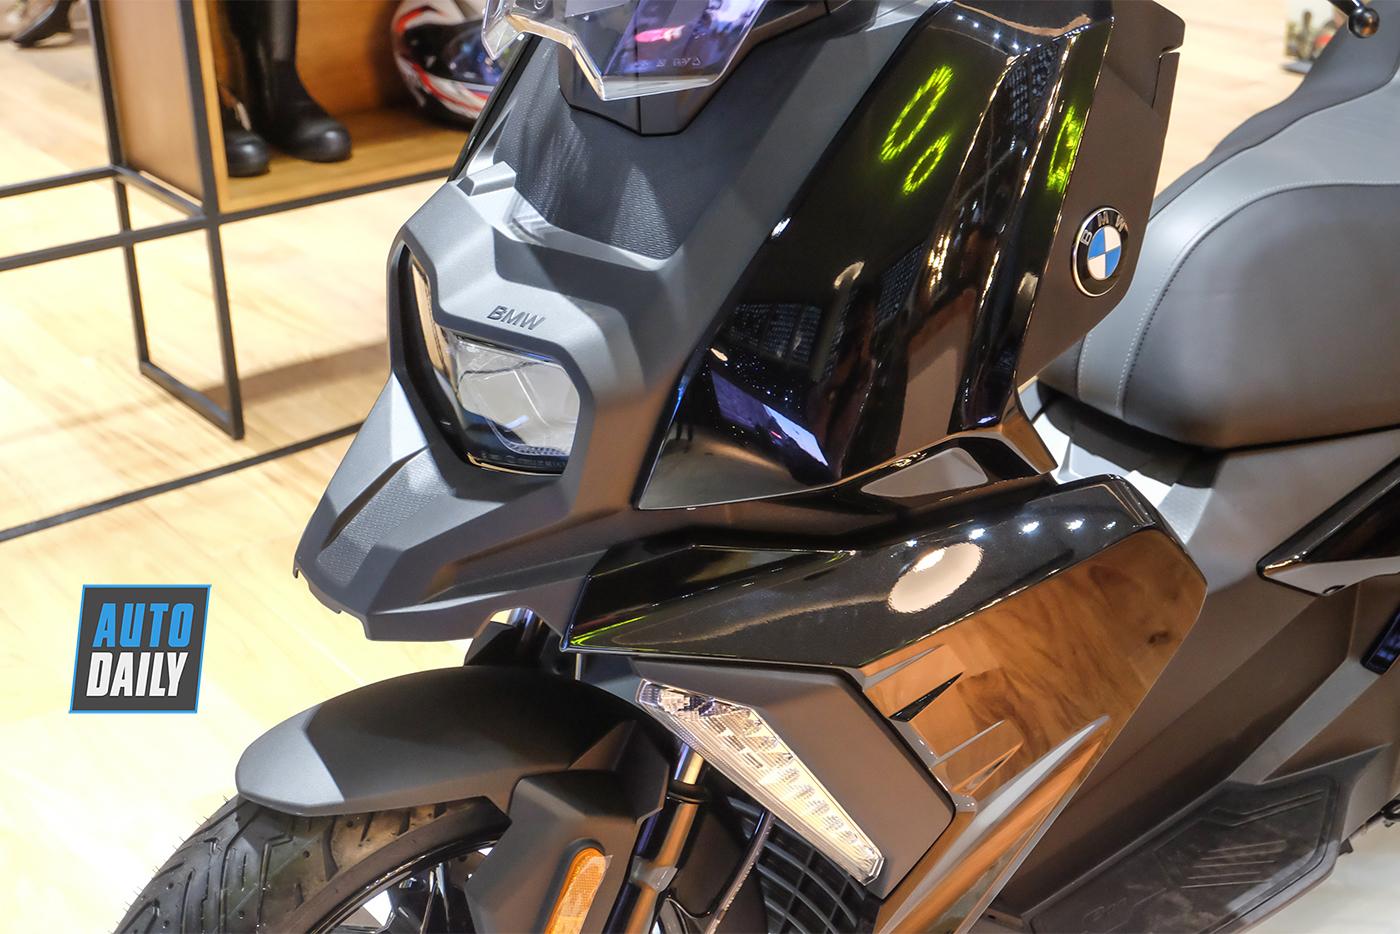 bmw-motorrad-c400x-22.jpg